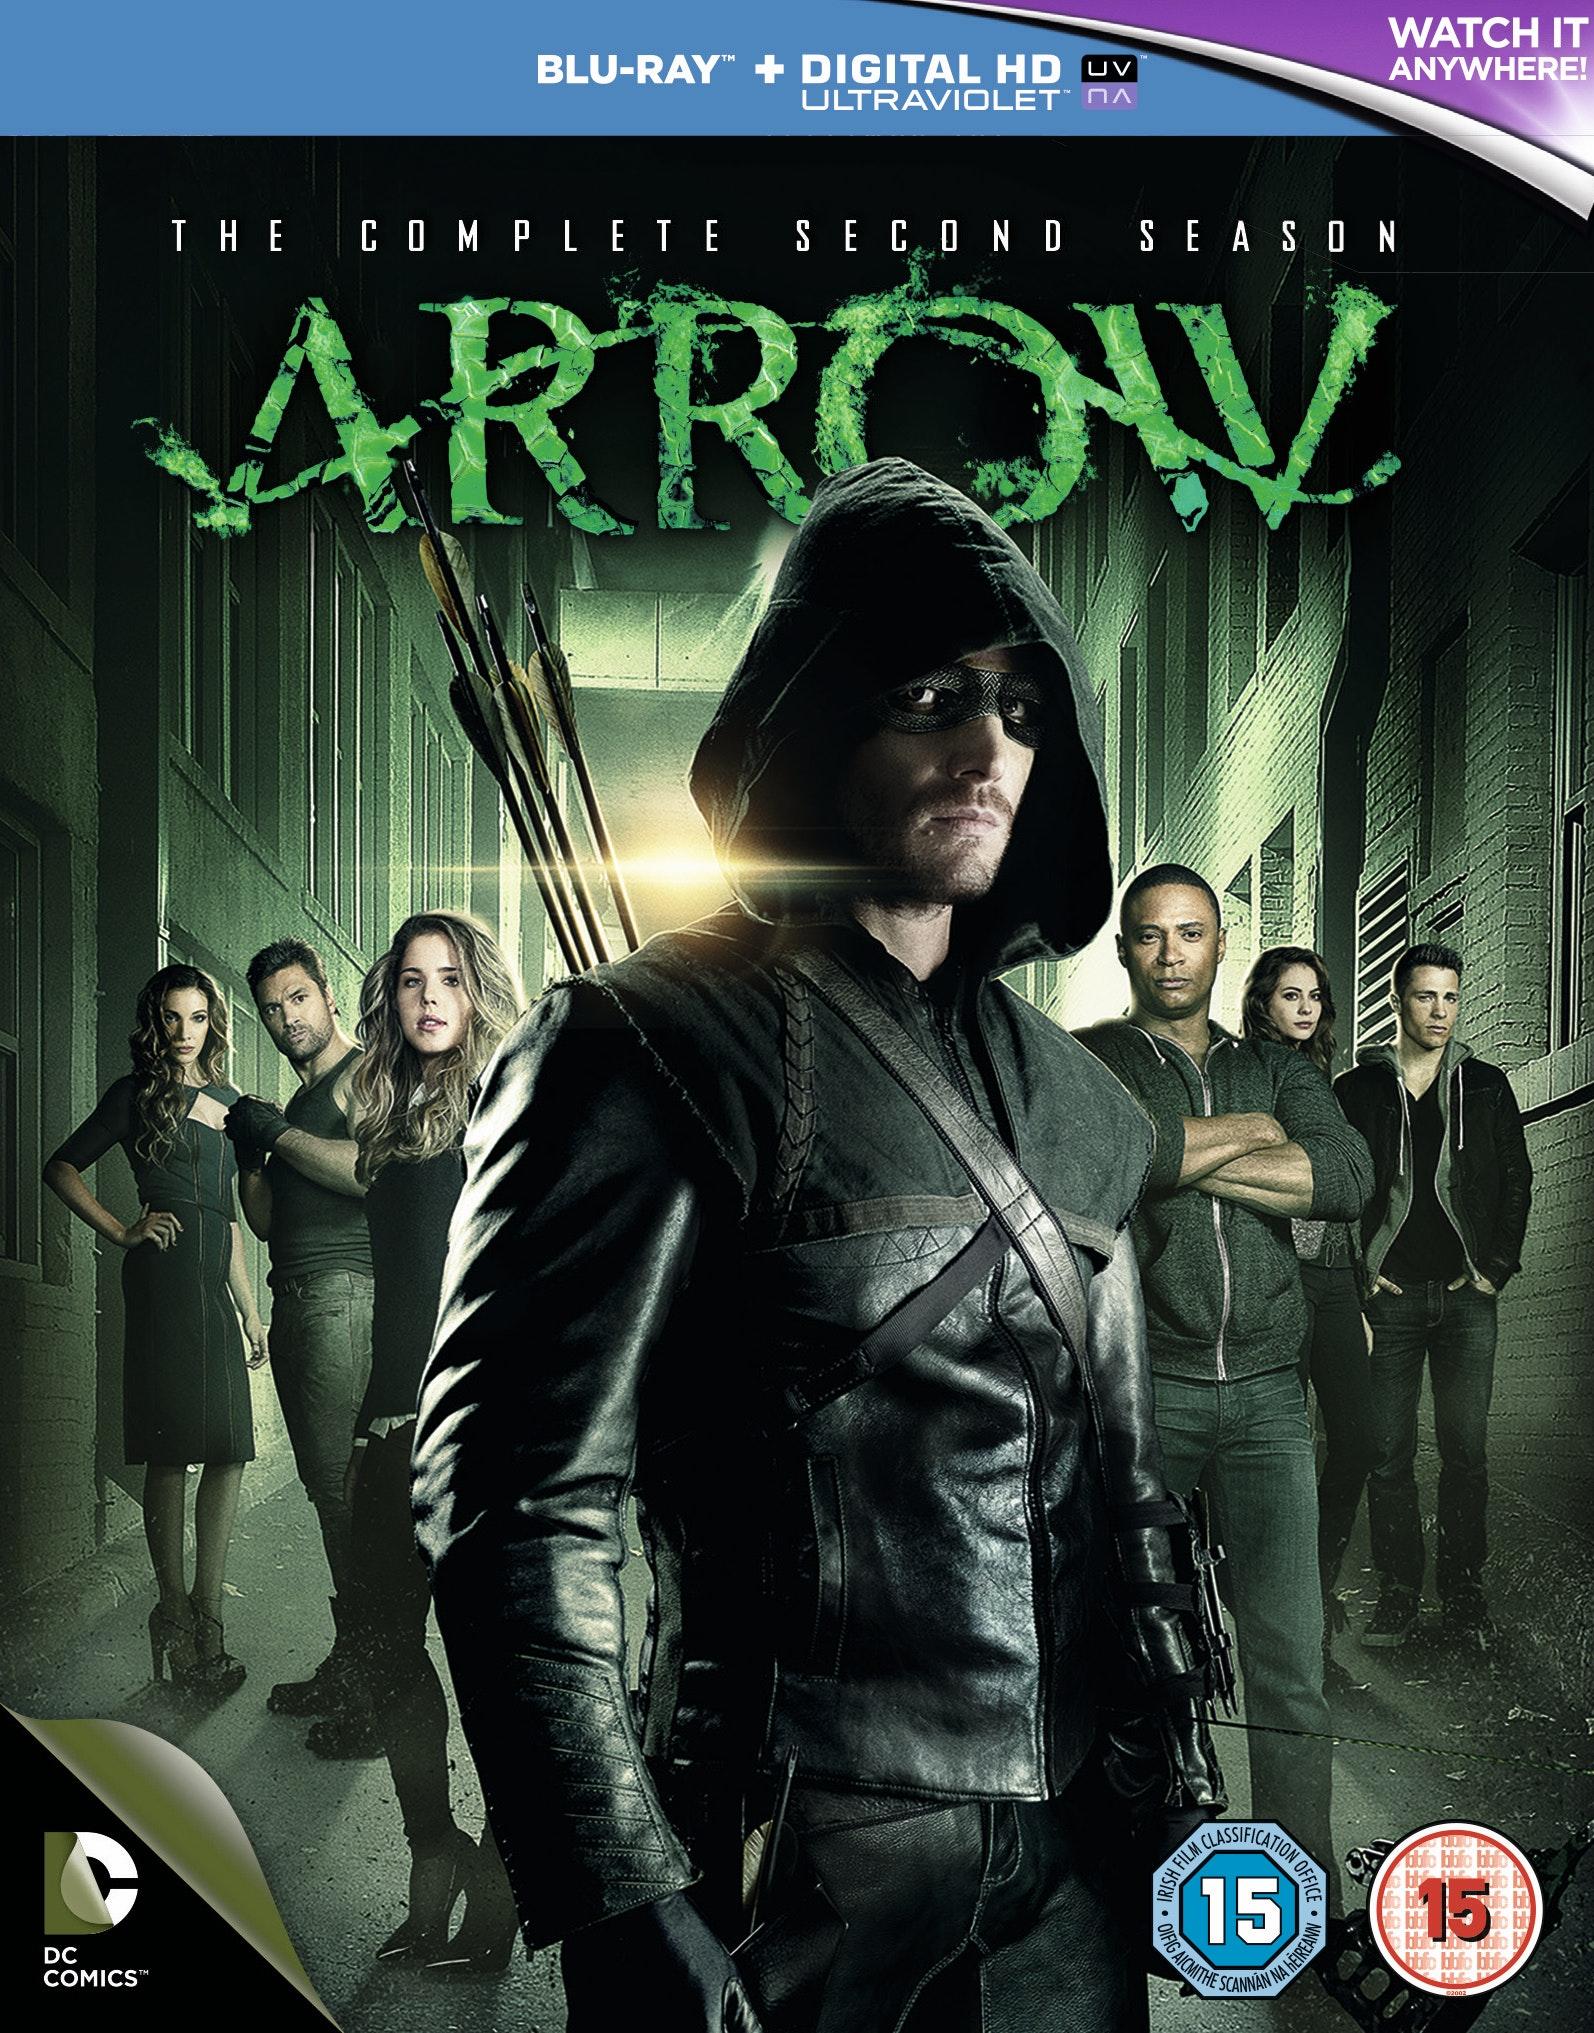 Arrow Blu-ray sweepstakes